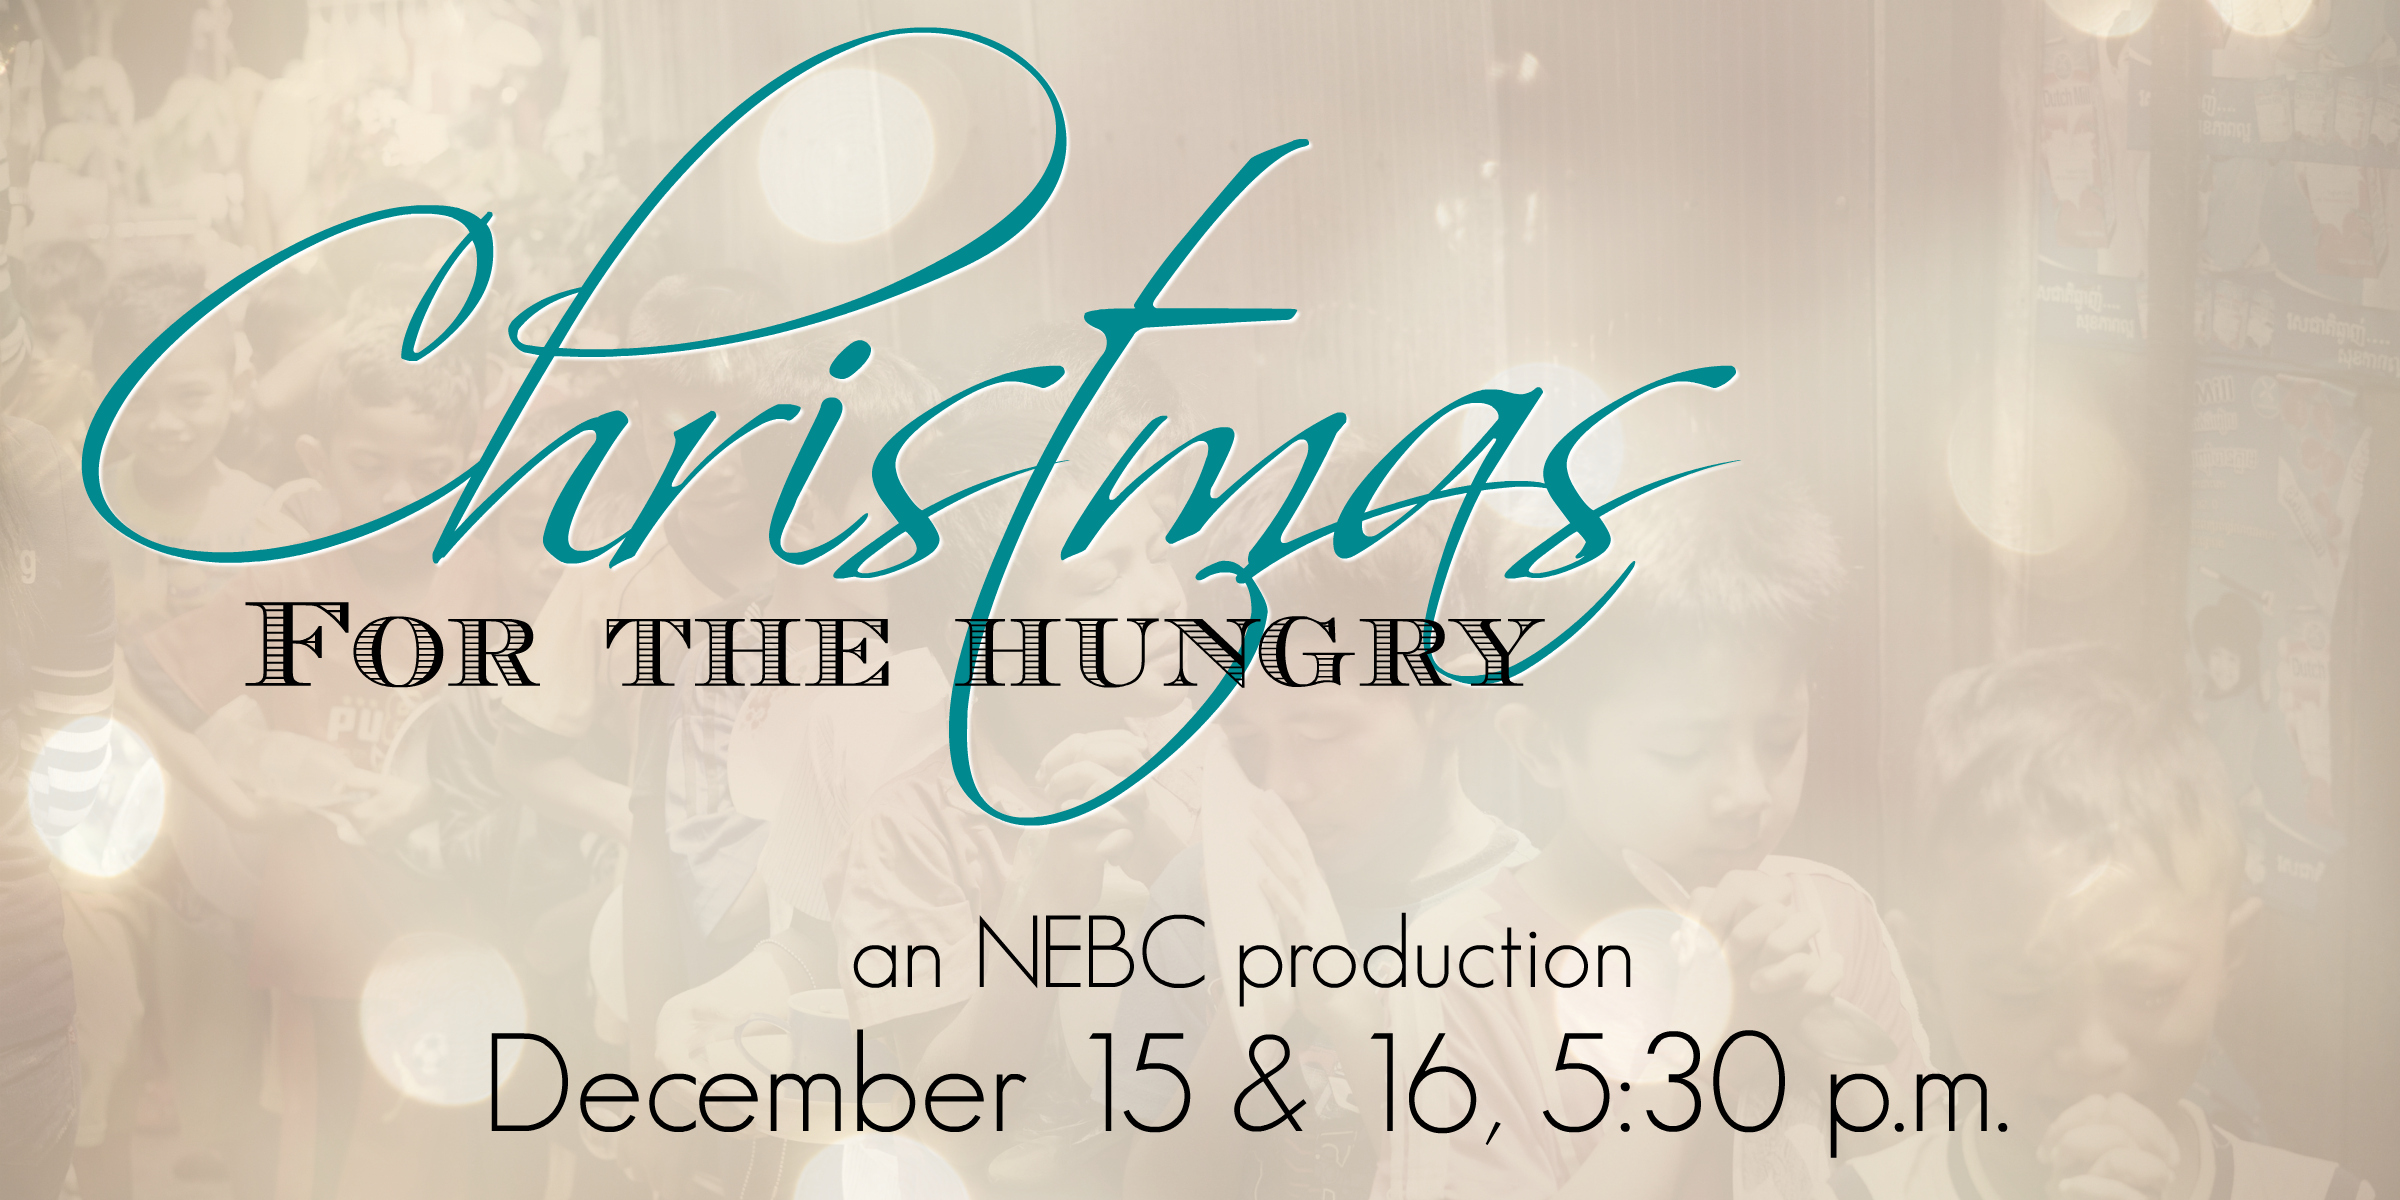 Christmas for the Hungry_1.jpg